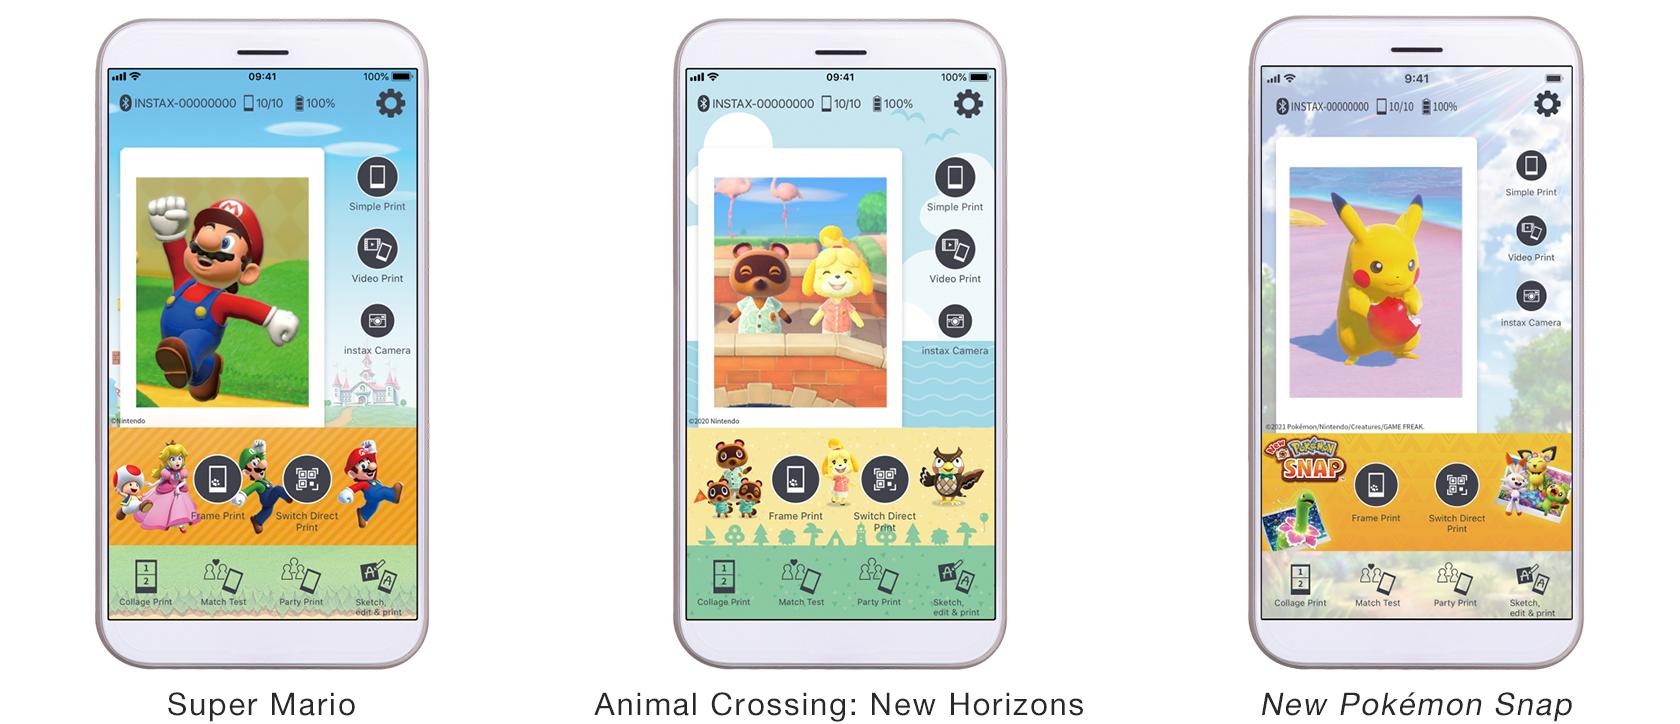 [image]App design(Super Mario, Animal Crossing: New Horizons, New Pokémon Snap)